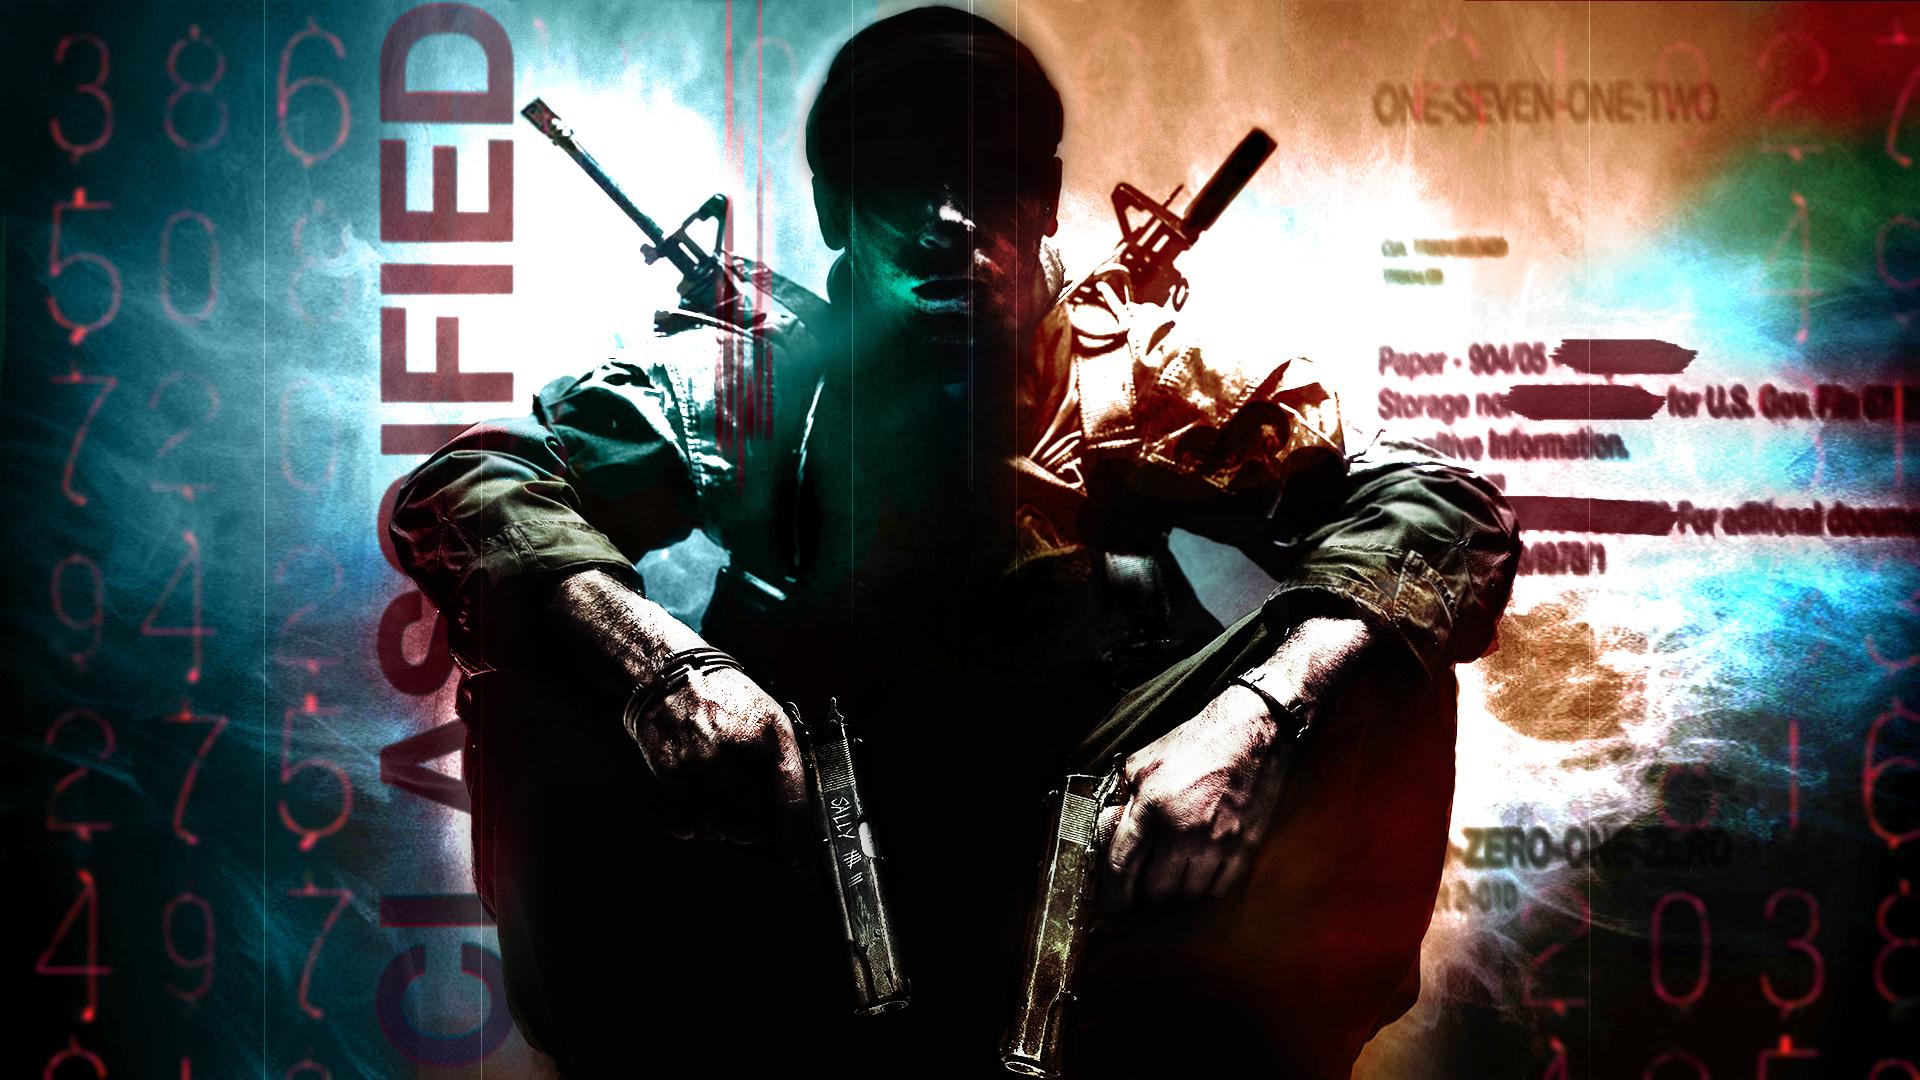 62 Black Ops Hd Wallpaper On Wallpapersafari